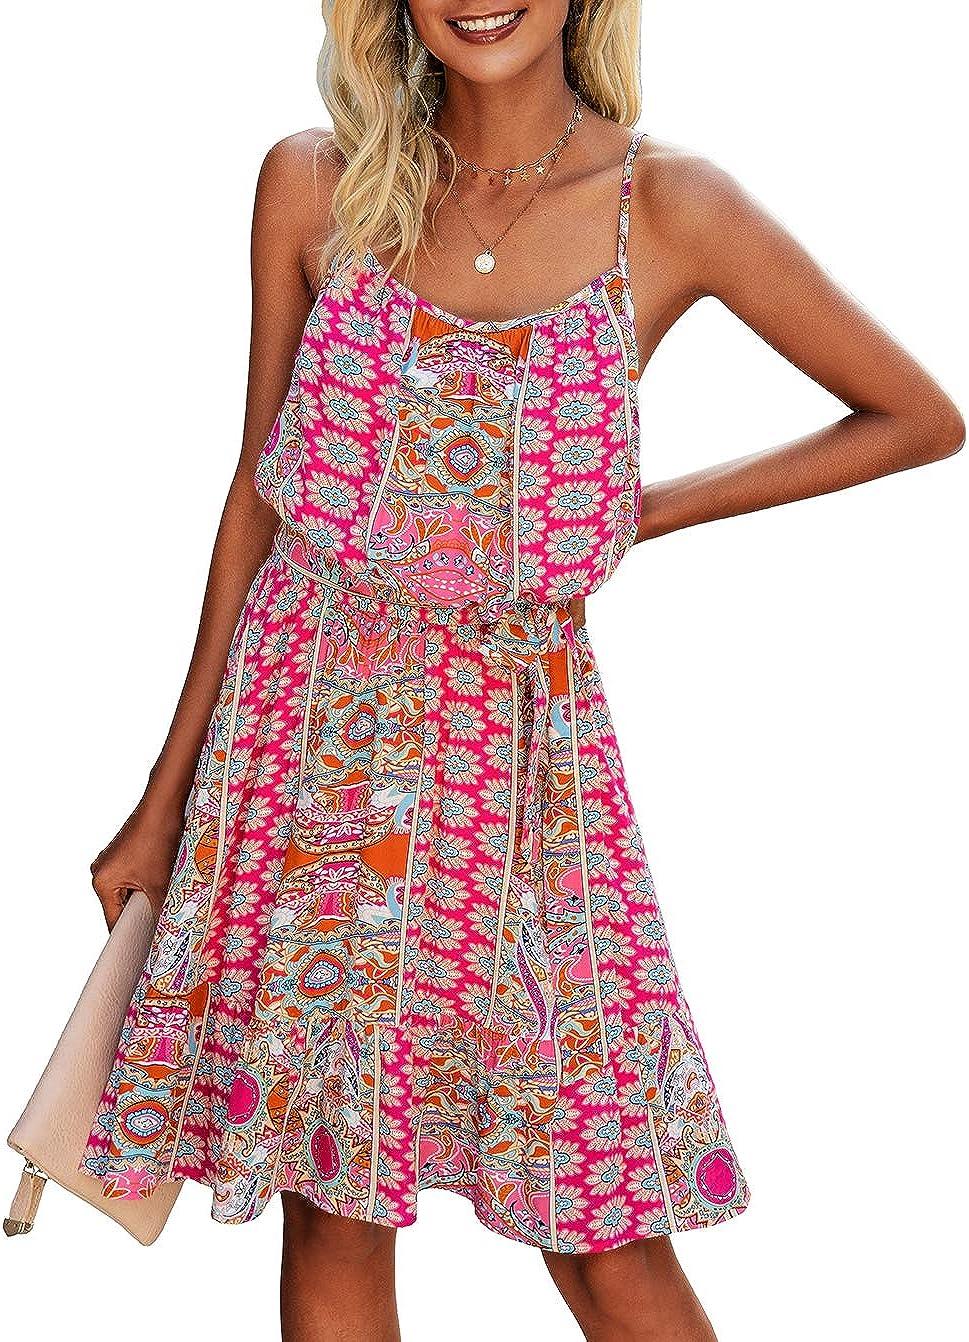 Updated 2021 – Top 10 Women's Garden Dress